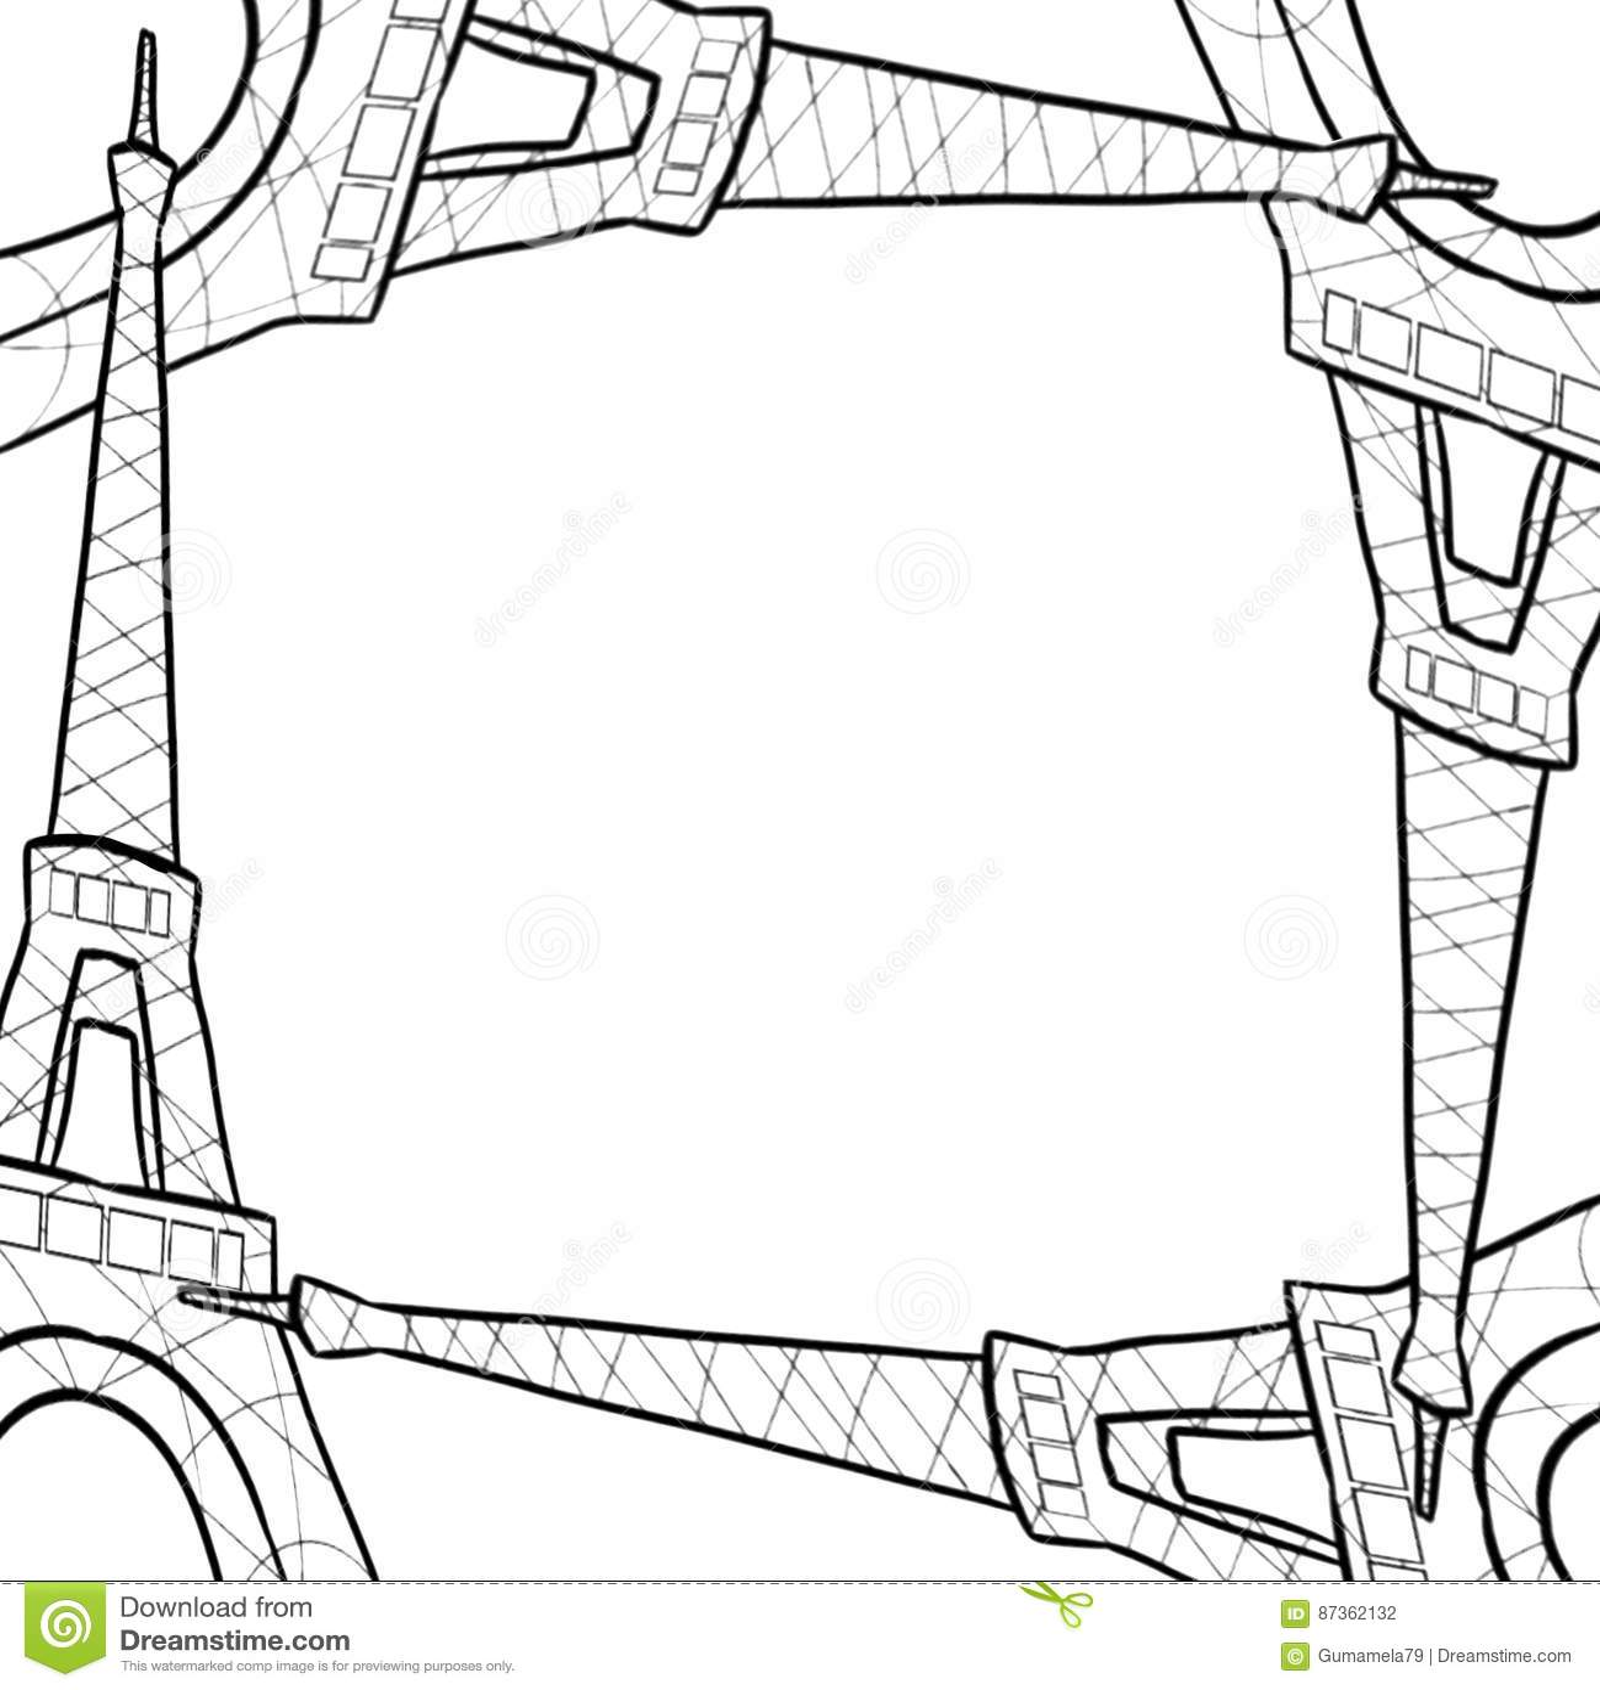 Hand Drawn Sketch Of Eiffel Tower Border Frame Stock